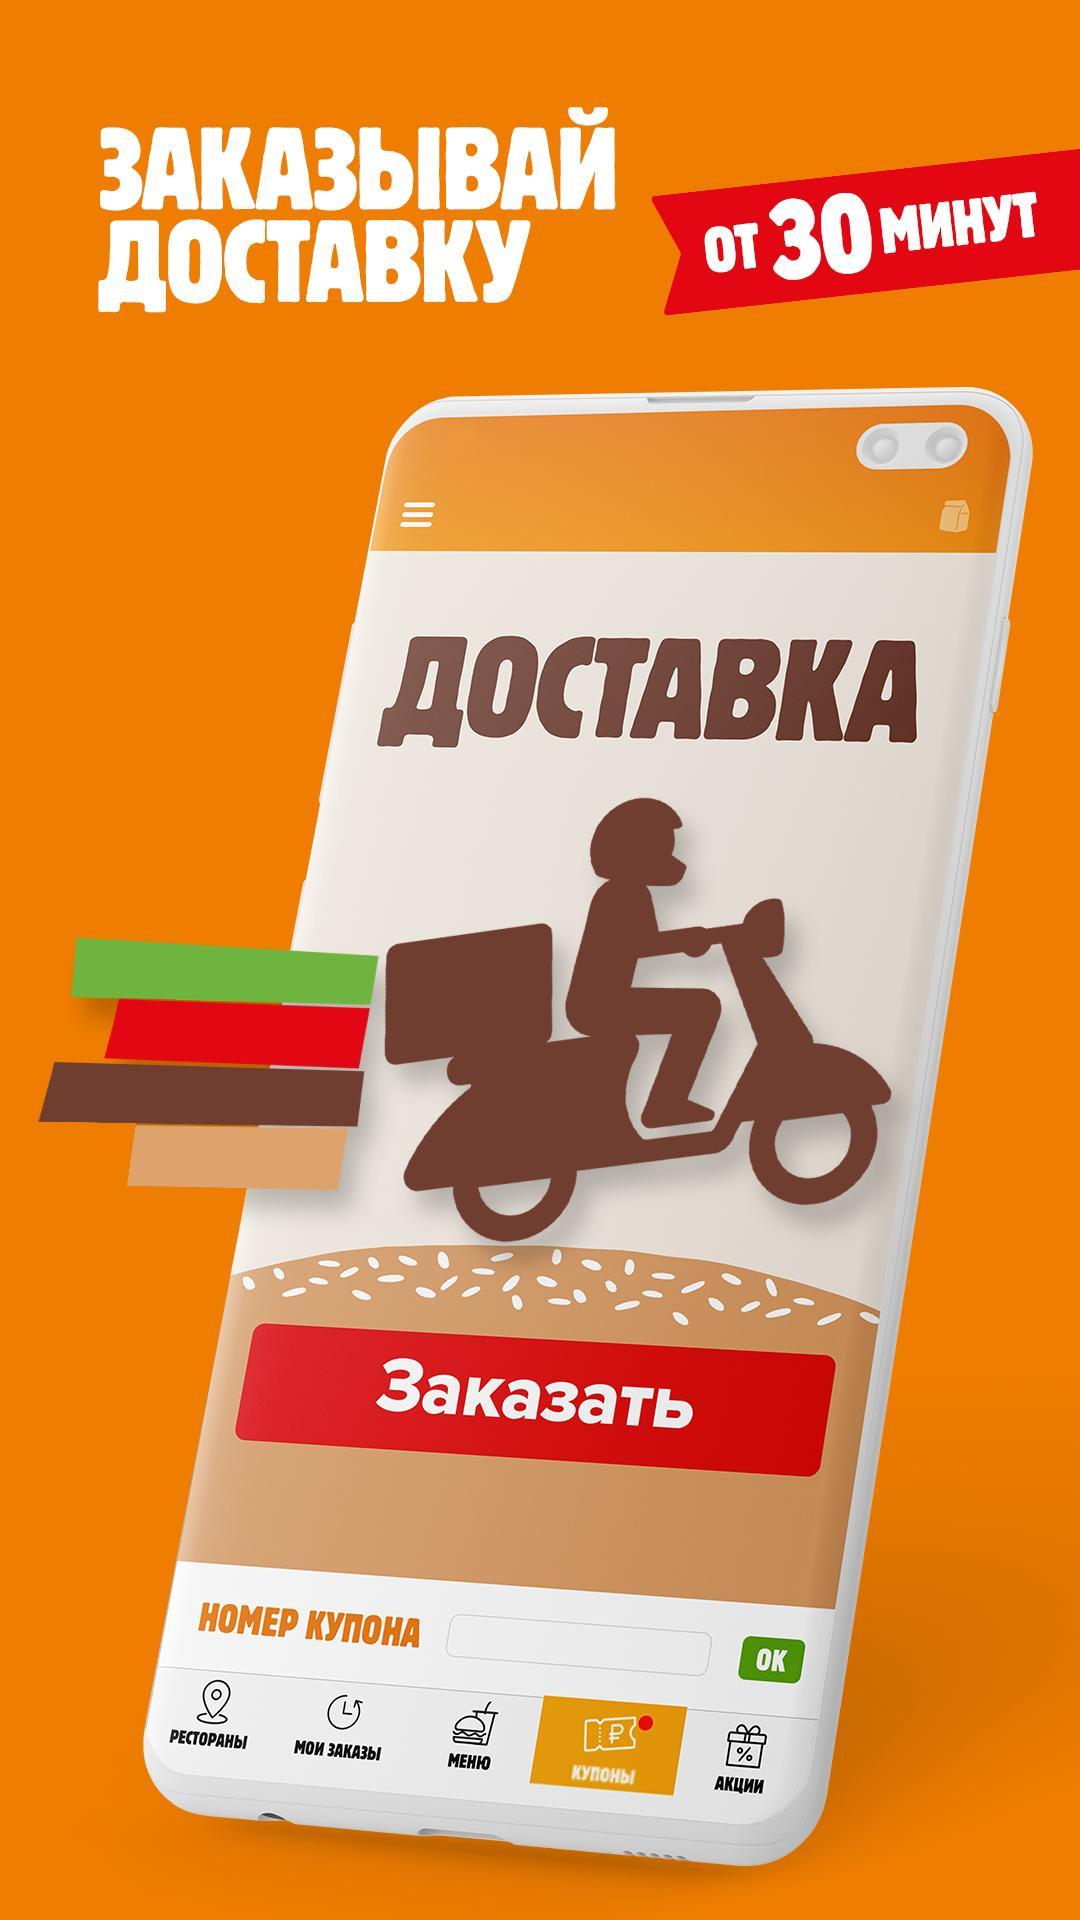 БУРГЕР КИНГ - 100 руб. за первый заказ 6.0.3 Screenshot 7